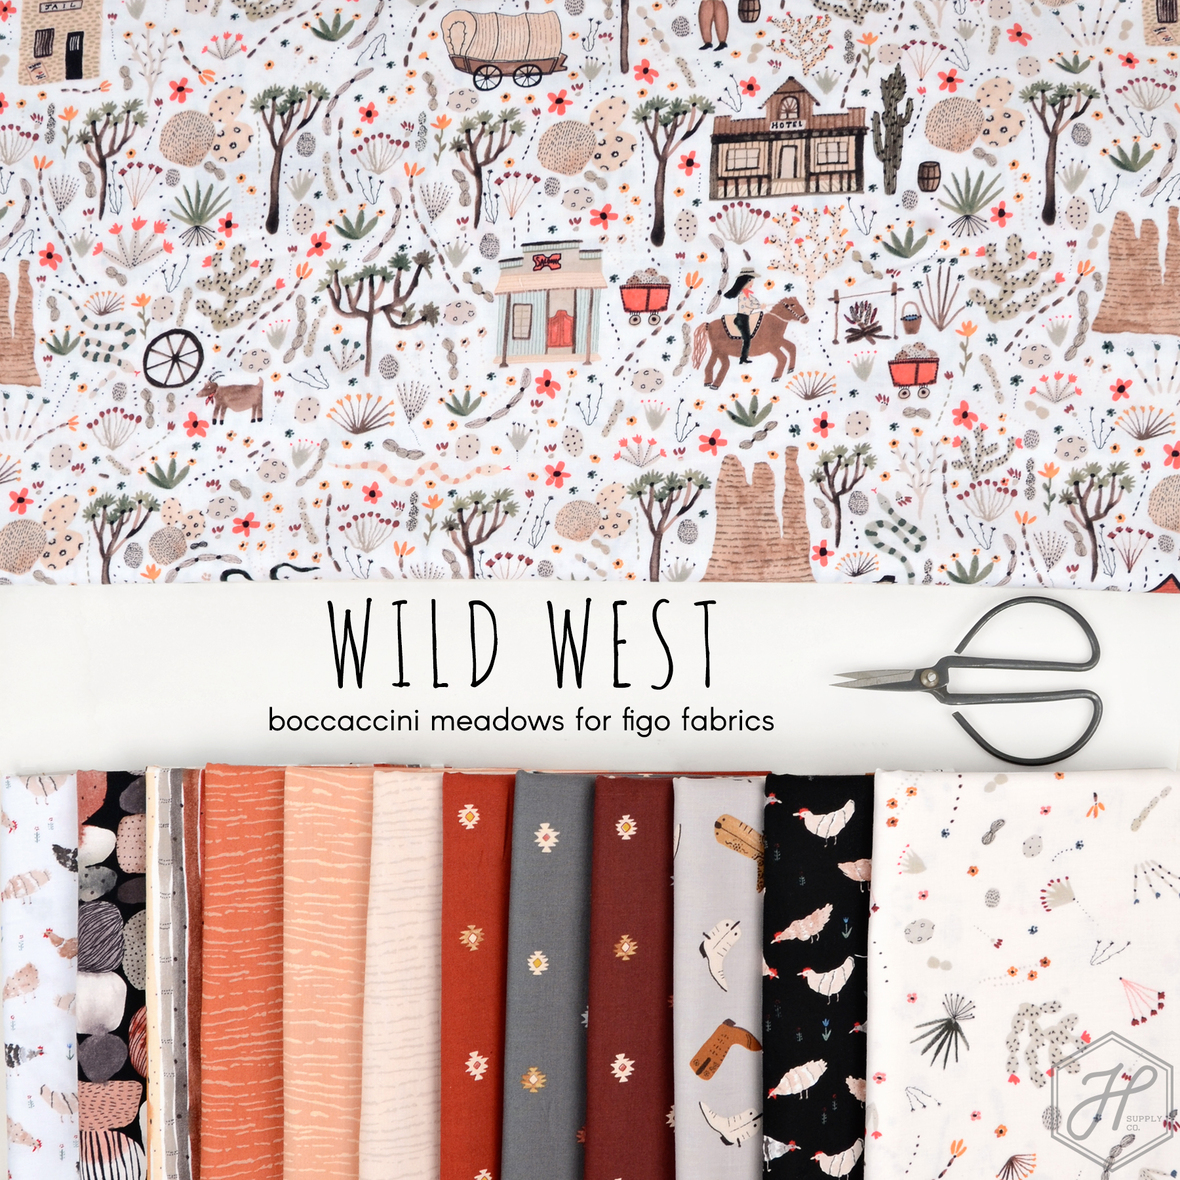 Wild West Boccaccini meadows for Figo Fabrics at Hawthorne Supply Co.